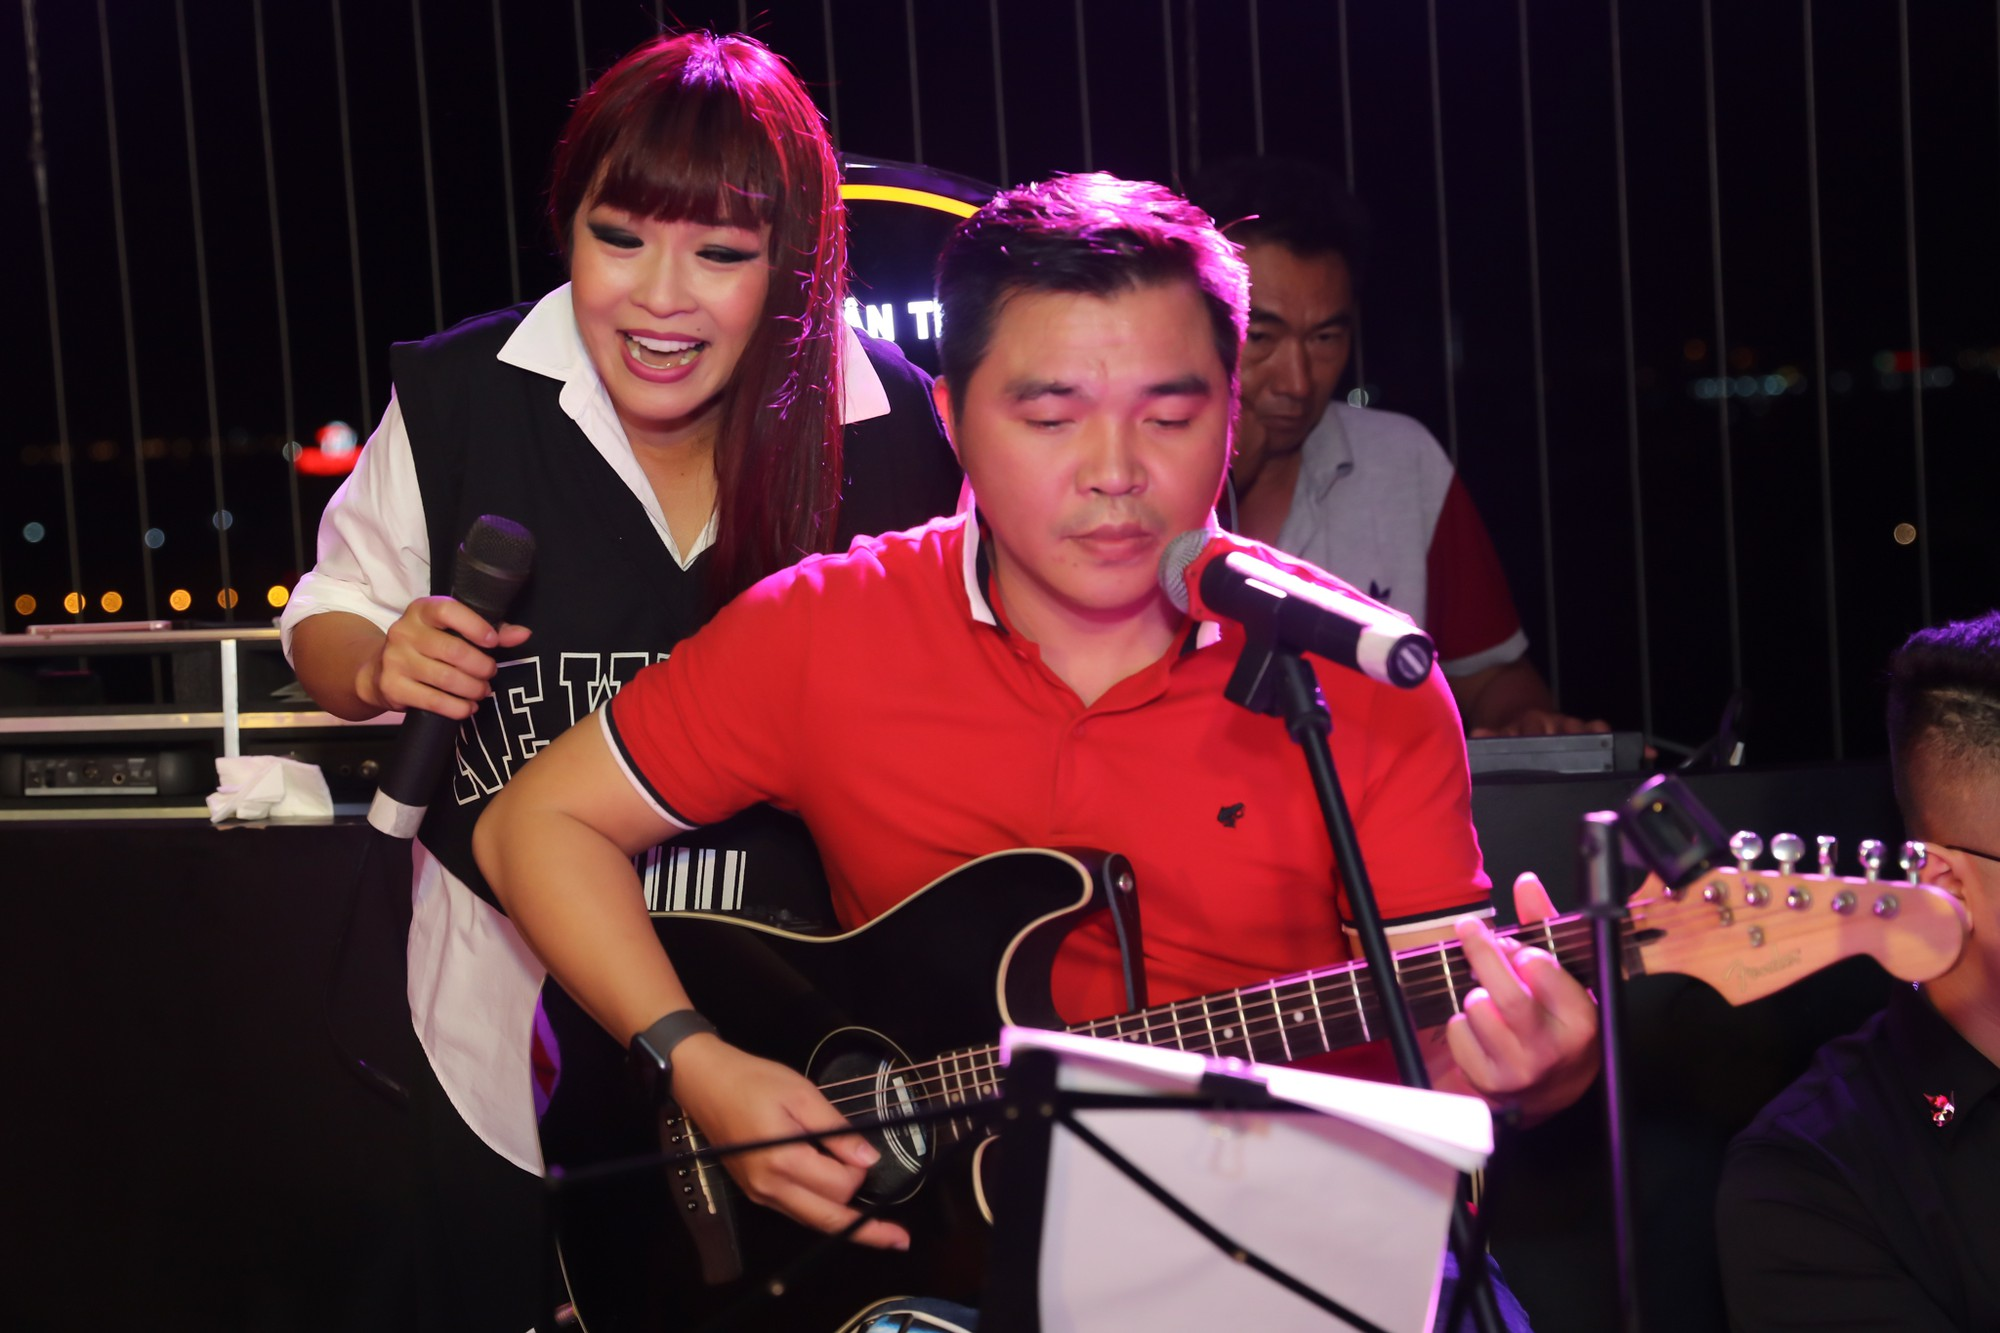 Le Minh MTV va man do giong cao vut cung Cahnh  (1)